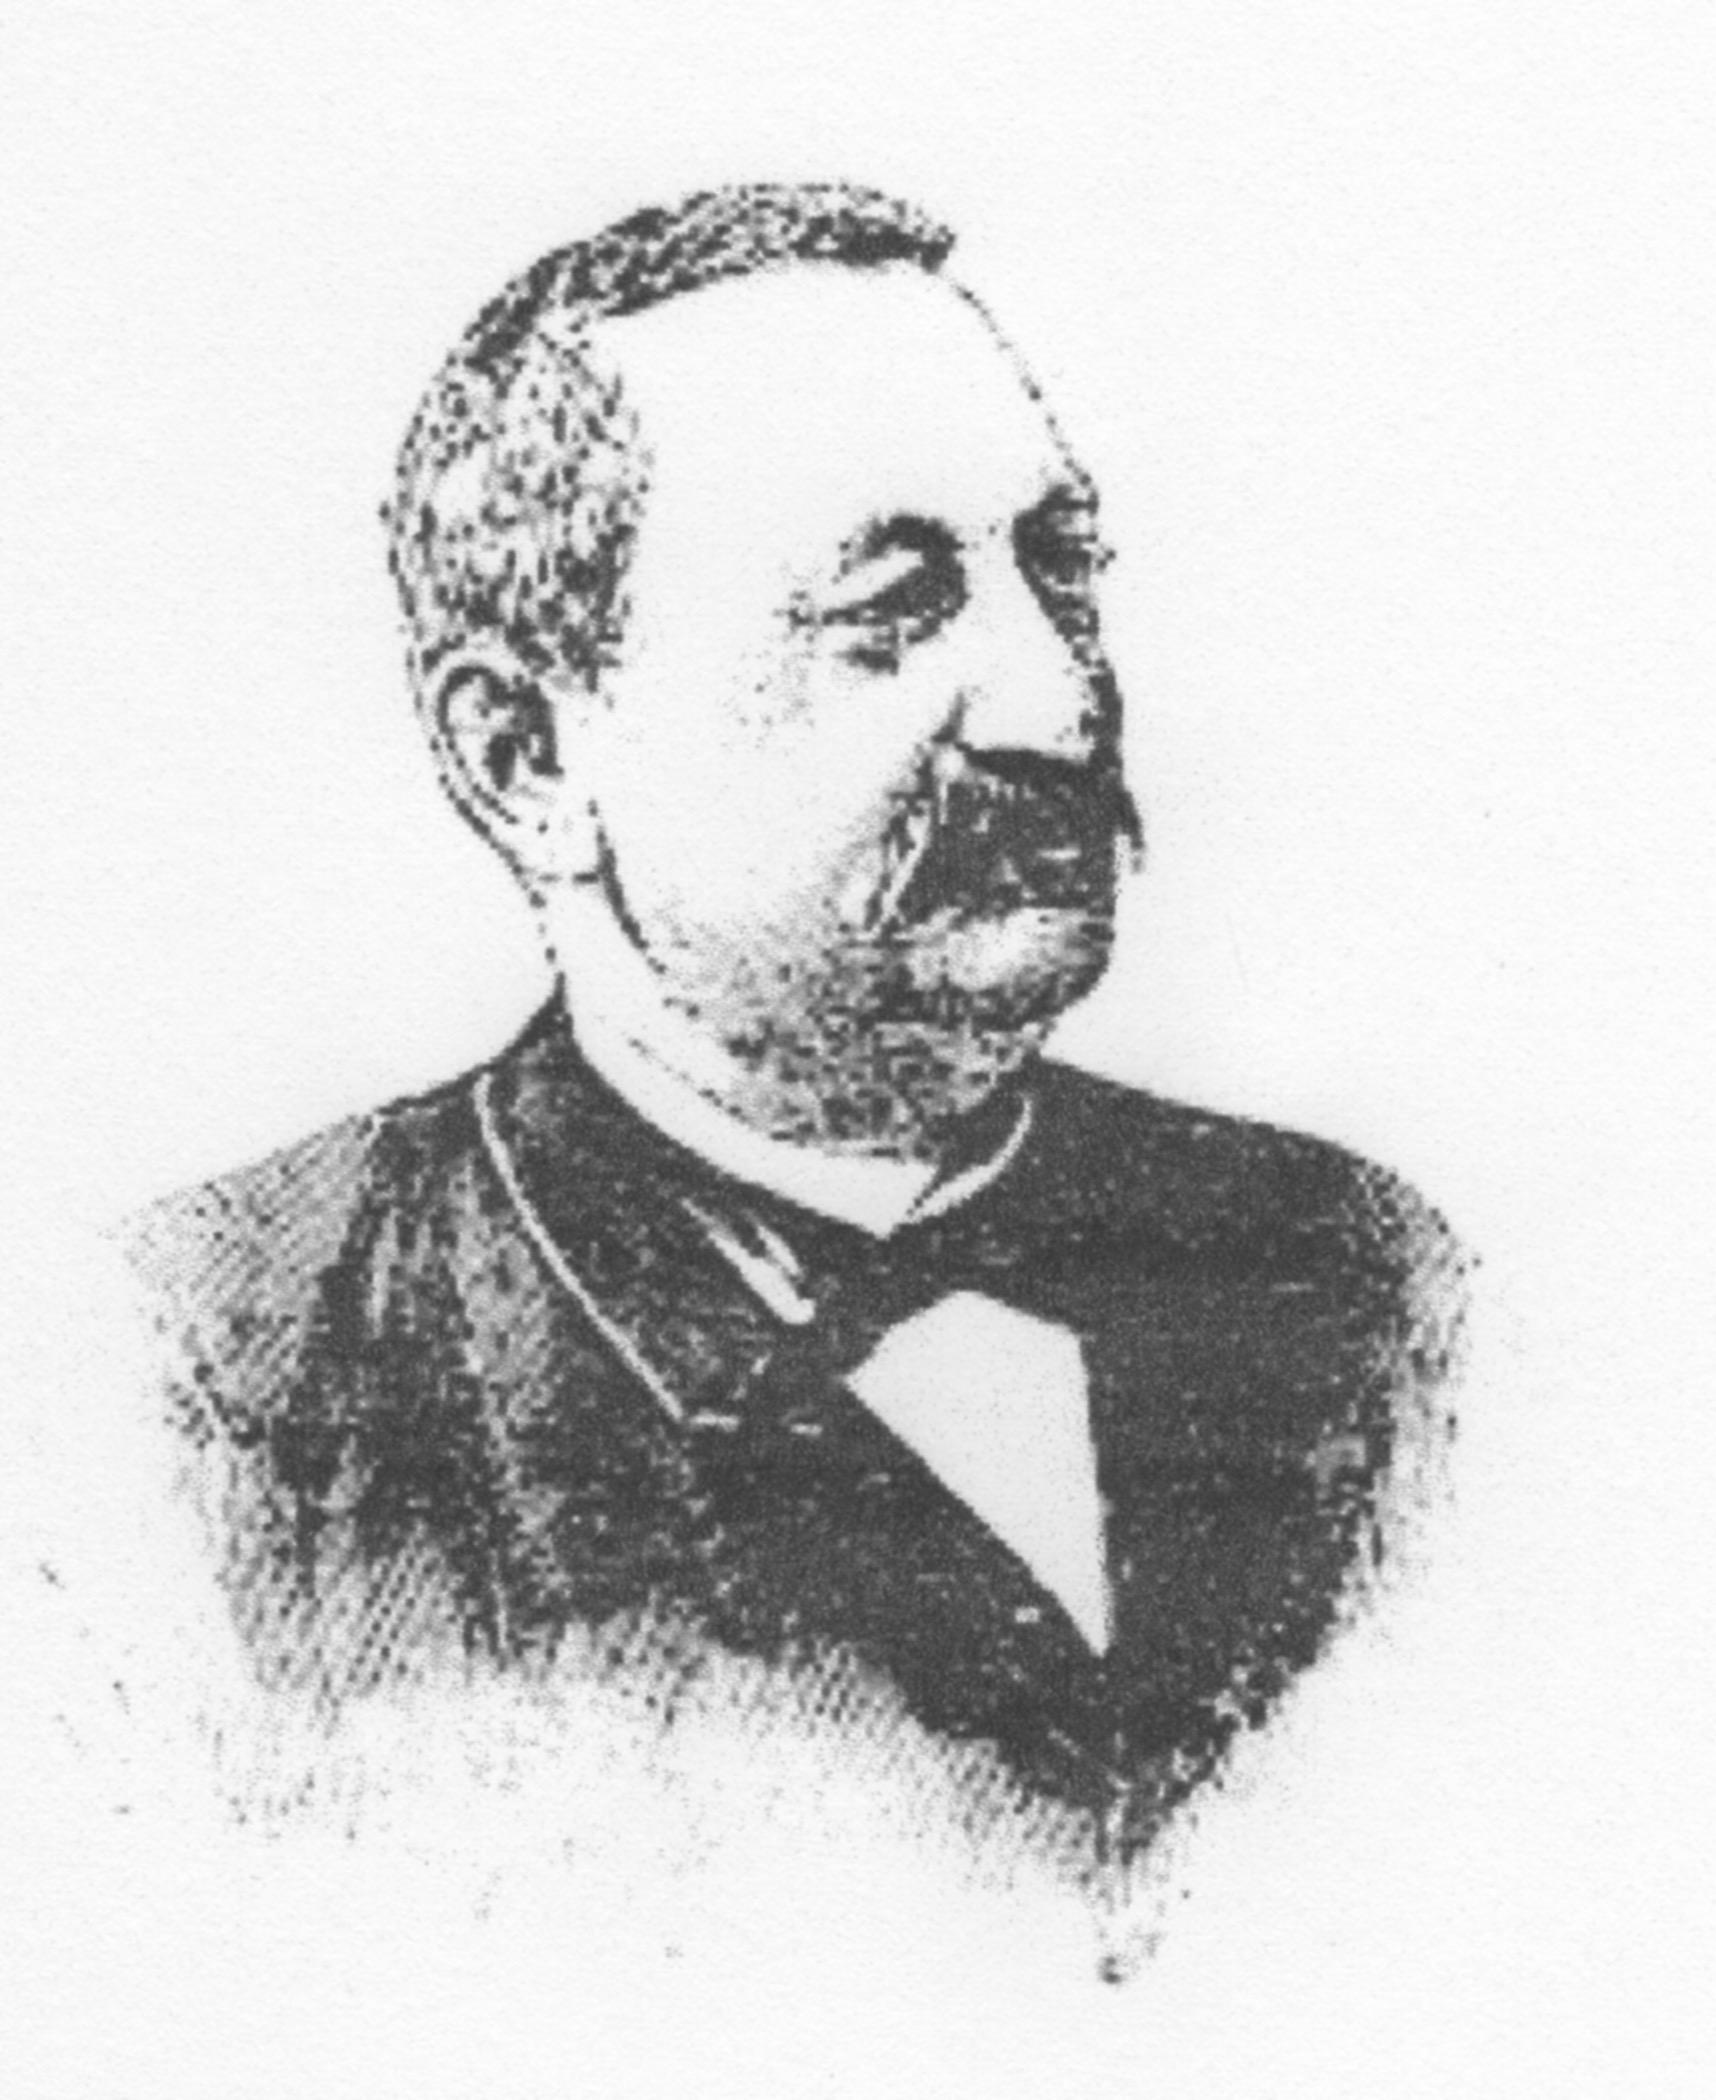 Paul Eudel